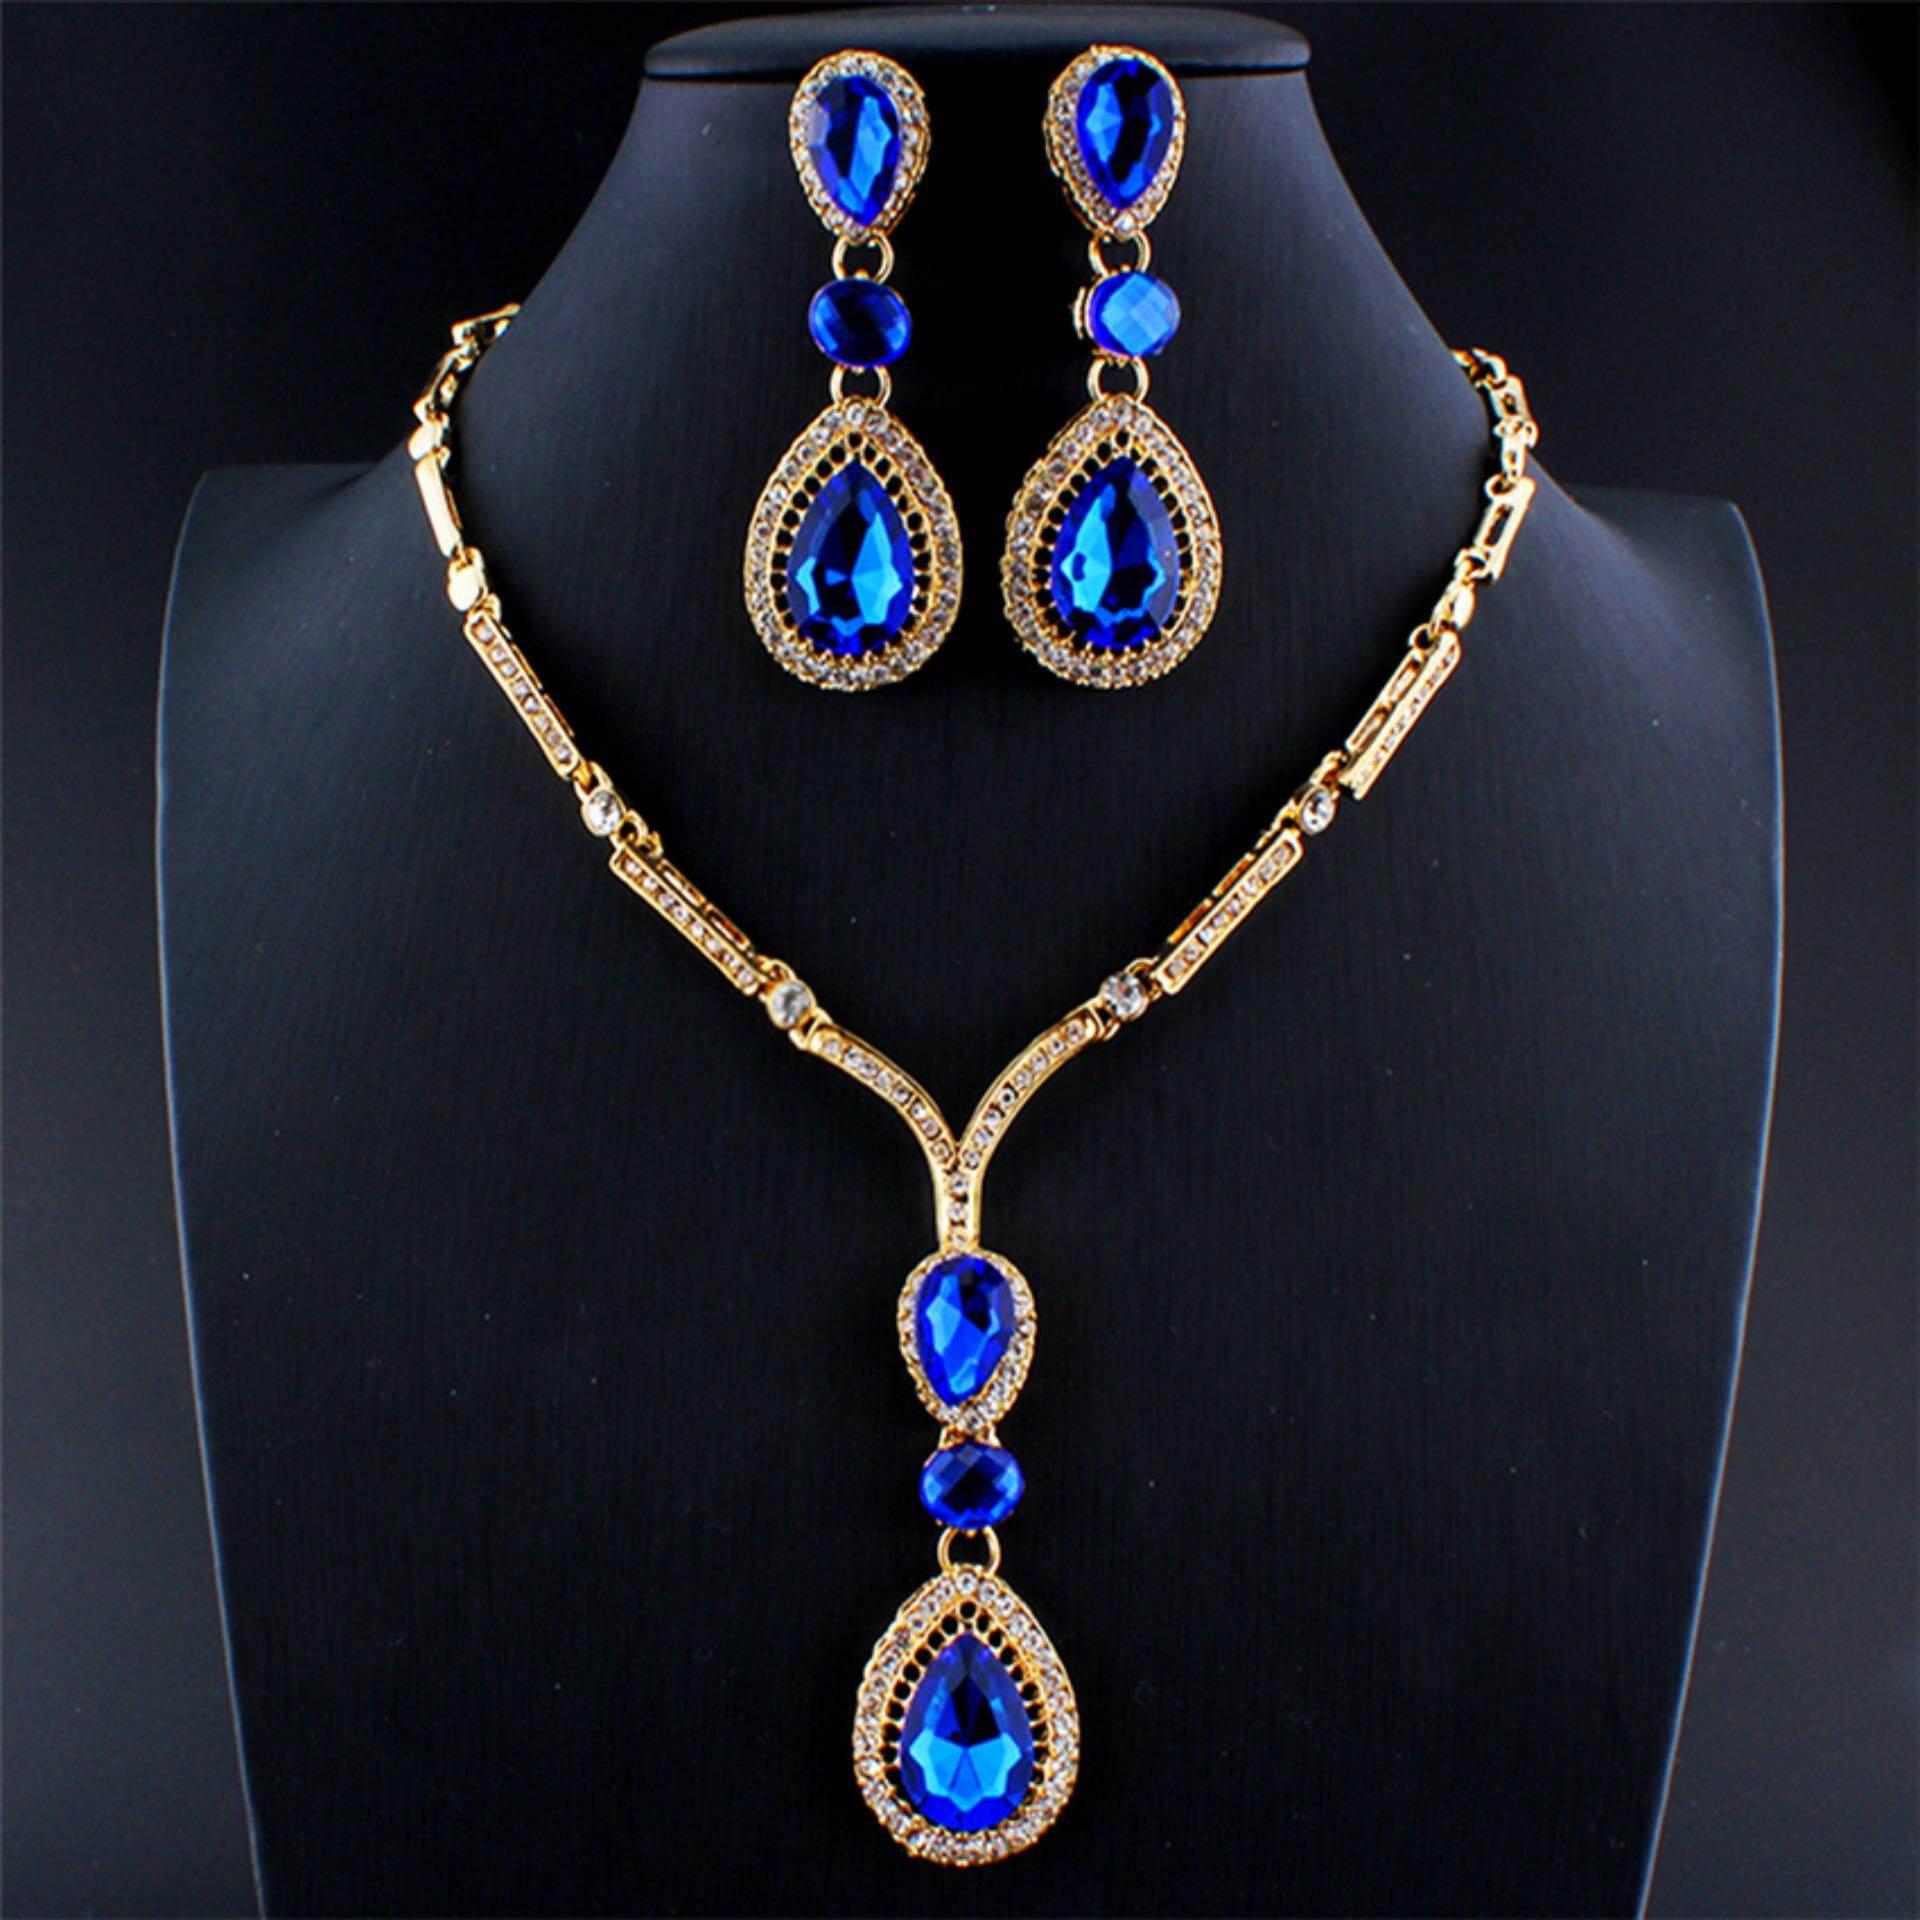 Antik Biru Wanita Perhiasan Set Gold Berlapis Air Jatuh Kalung Giwang Pernikahan Partai Aksesori-Internasional